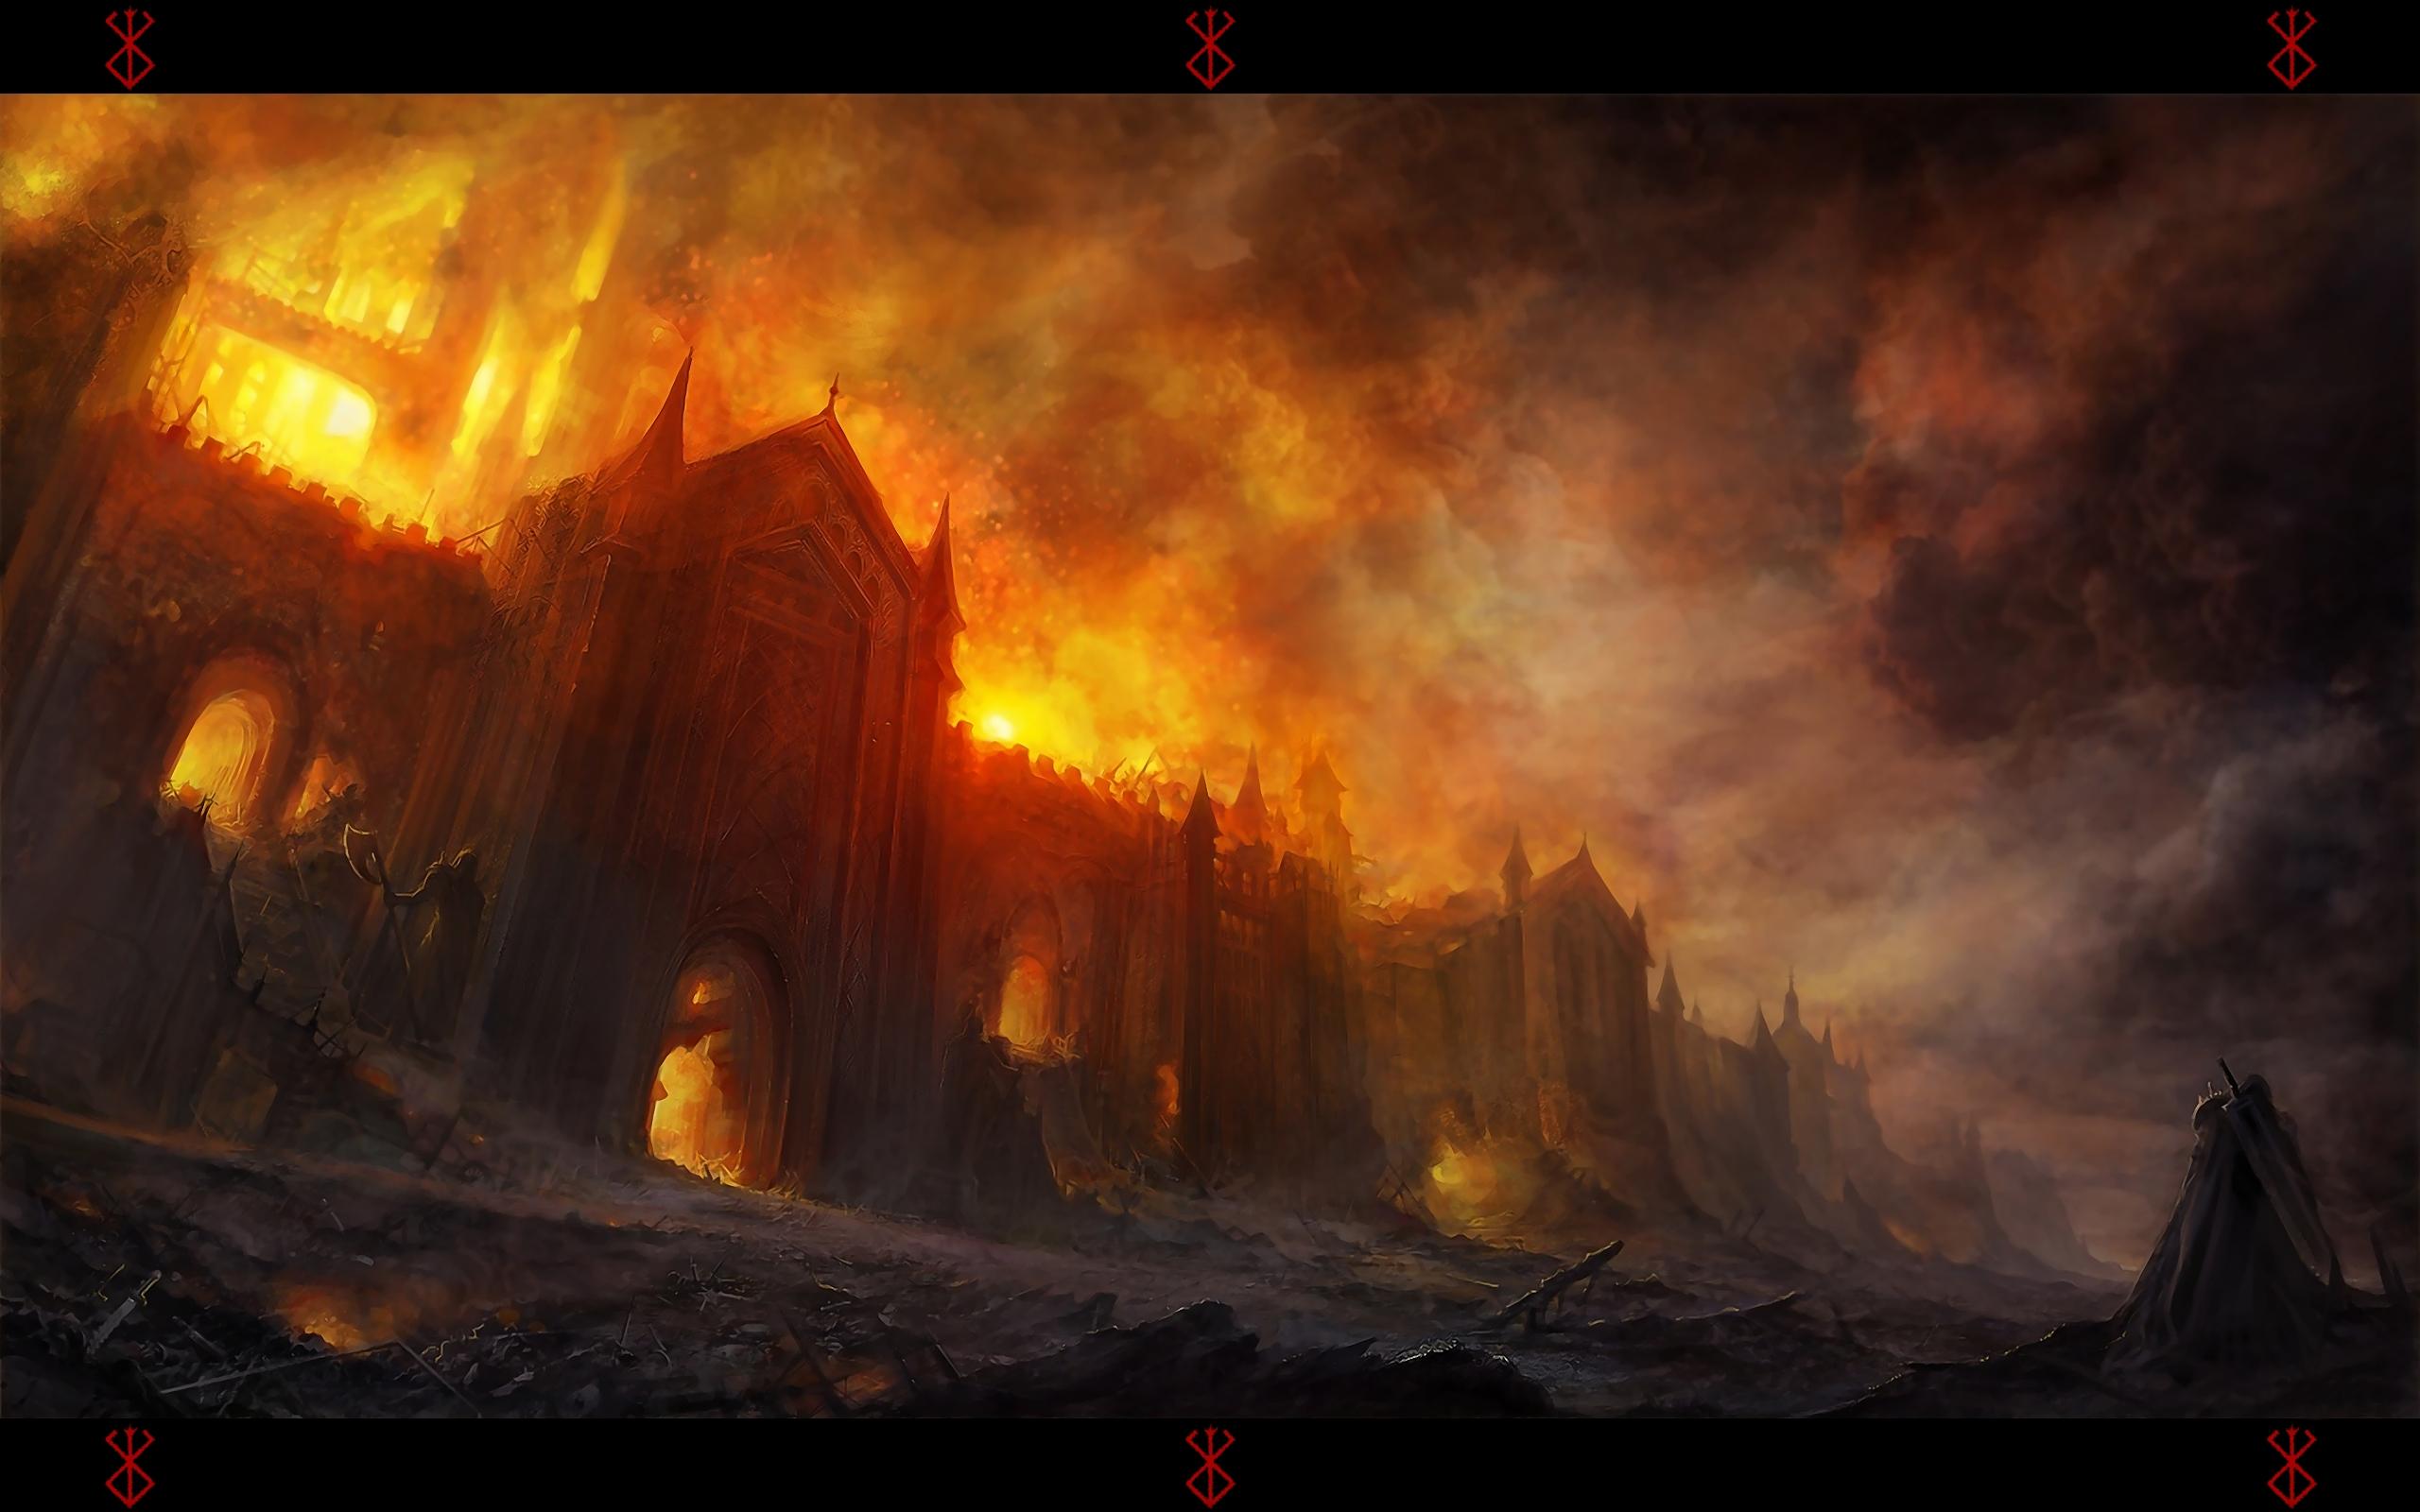 Castelo Papel de Parede HD | Plano de Fundo | 2560x1600 | ID:83613 -  Wallpaper Abyss